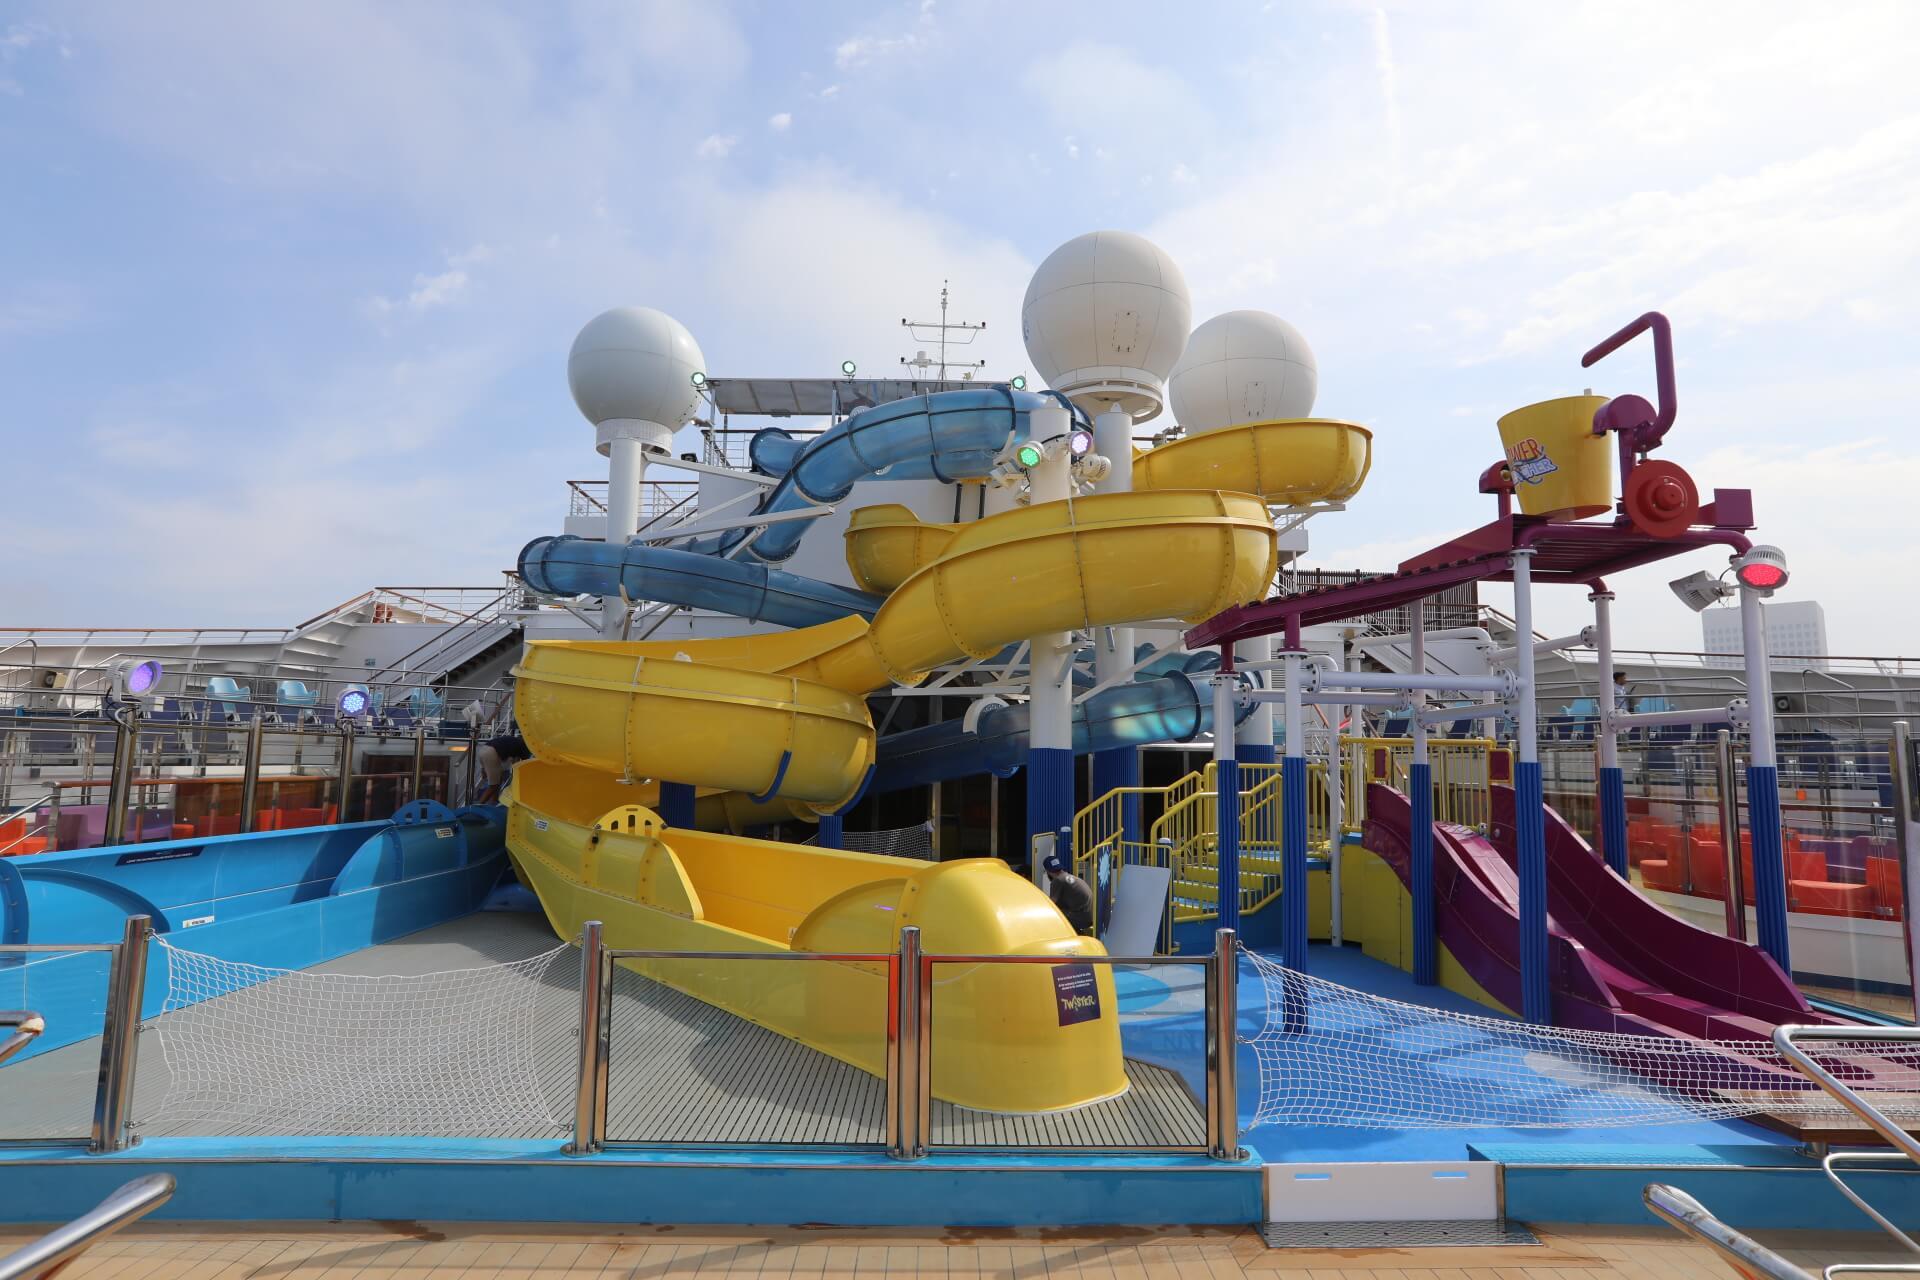 carnival freedom parc waterworks